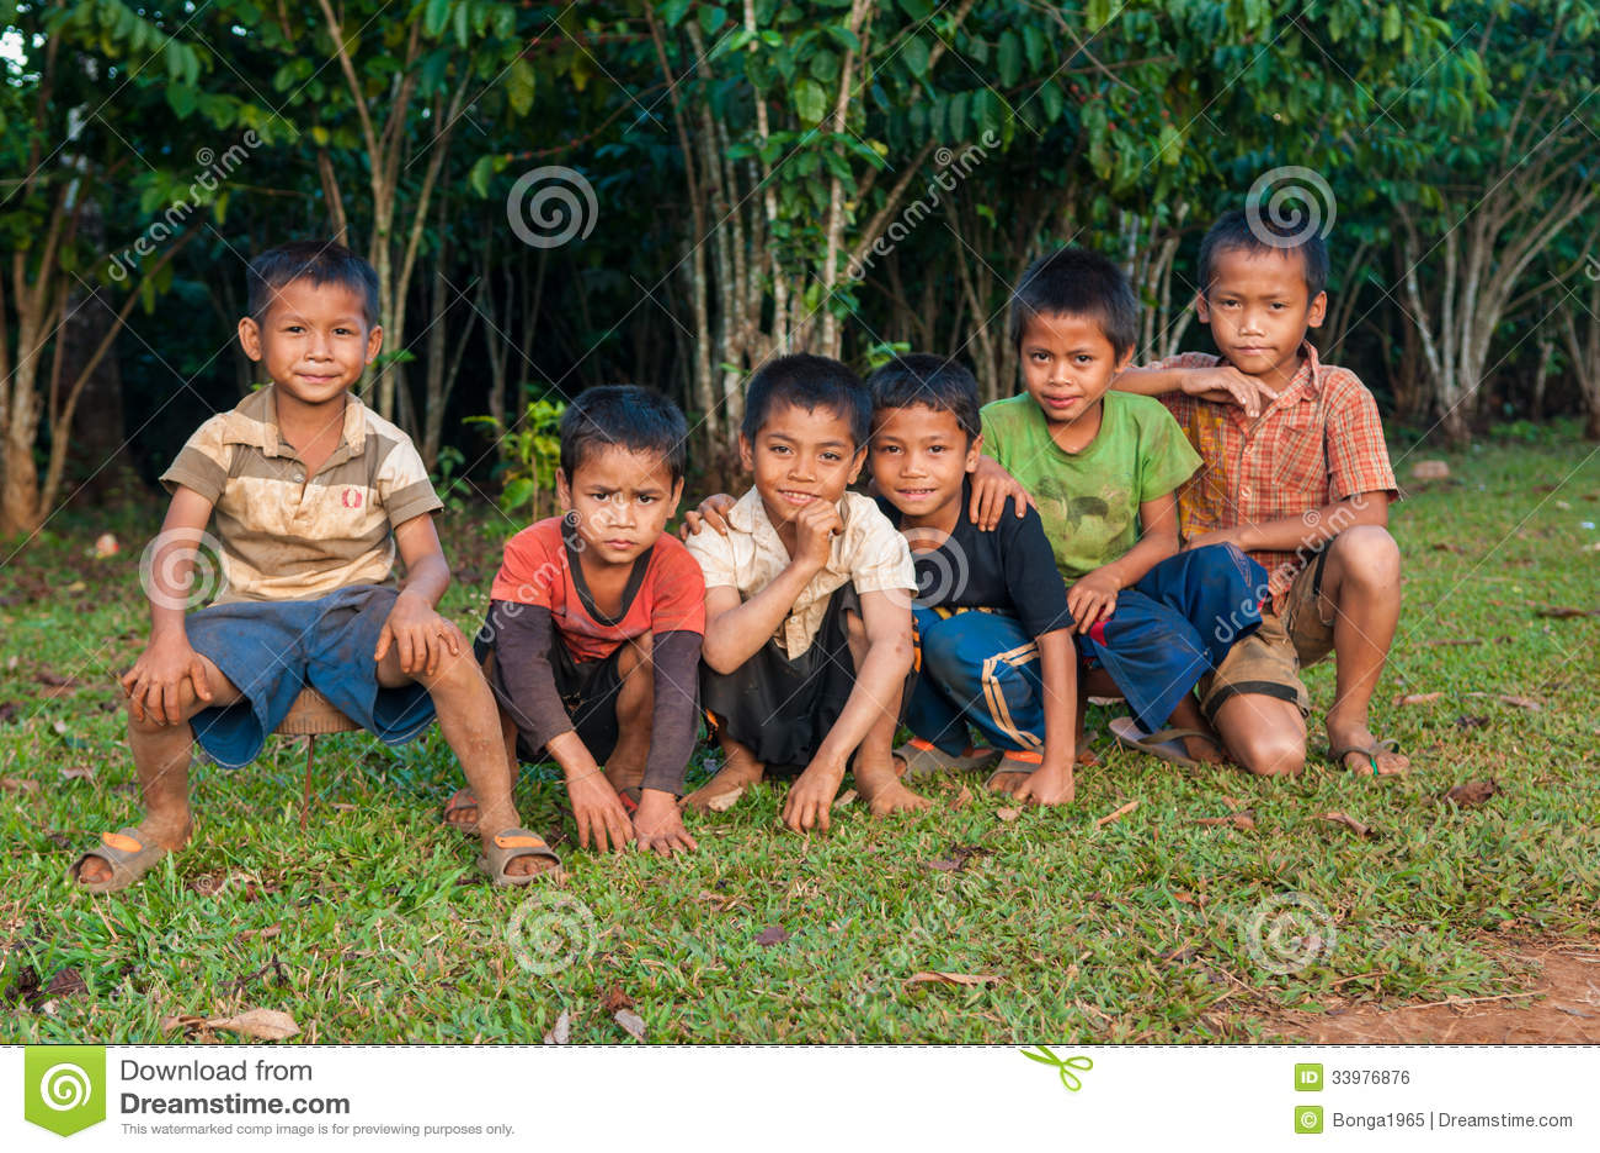 Ethnic boys